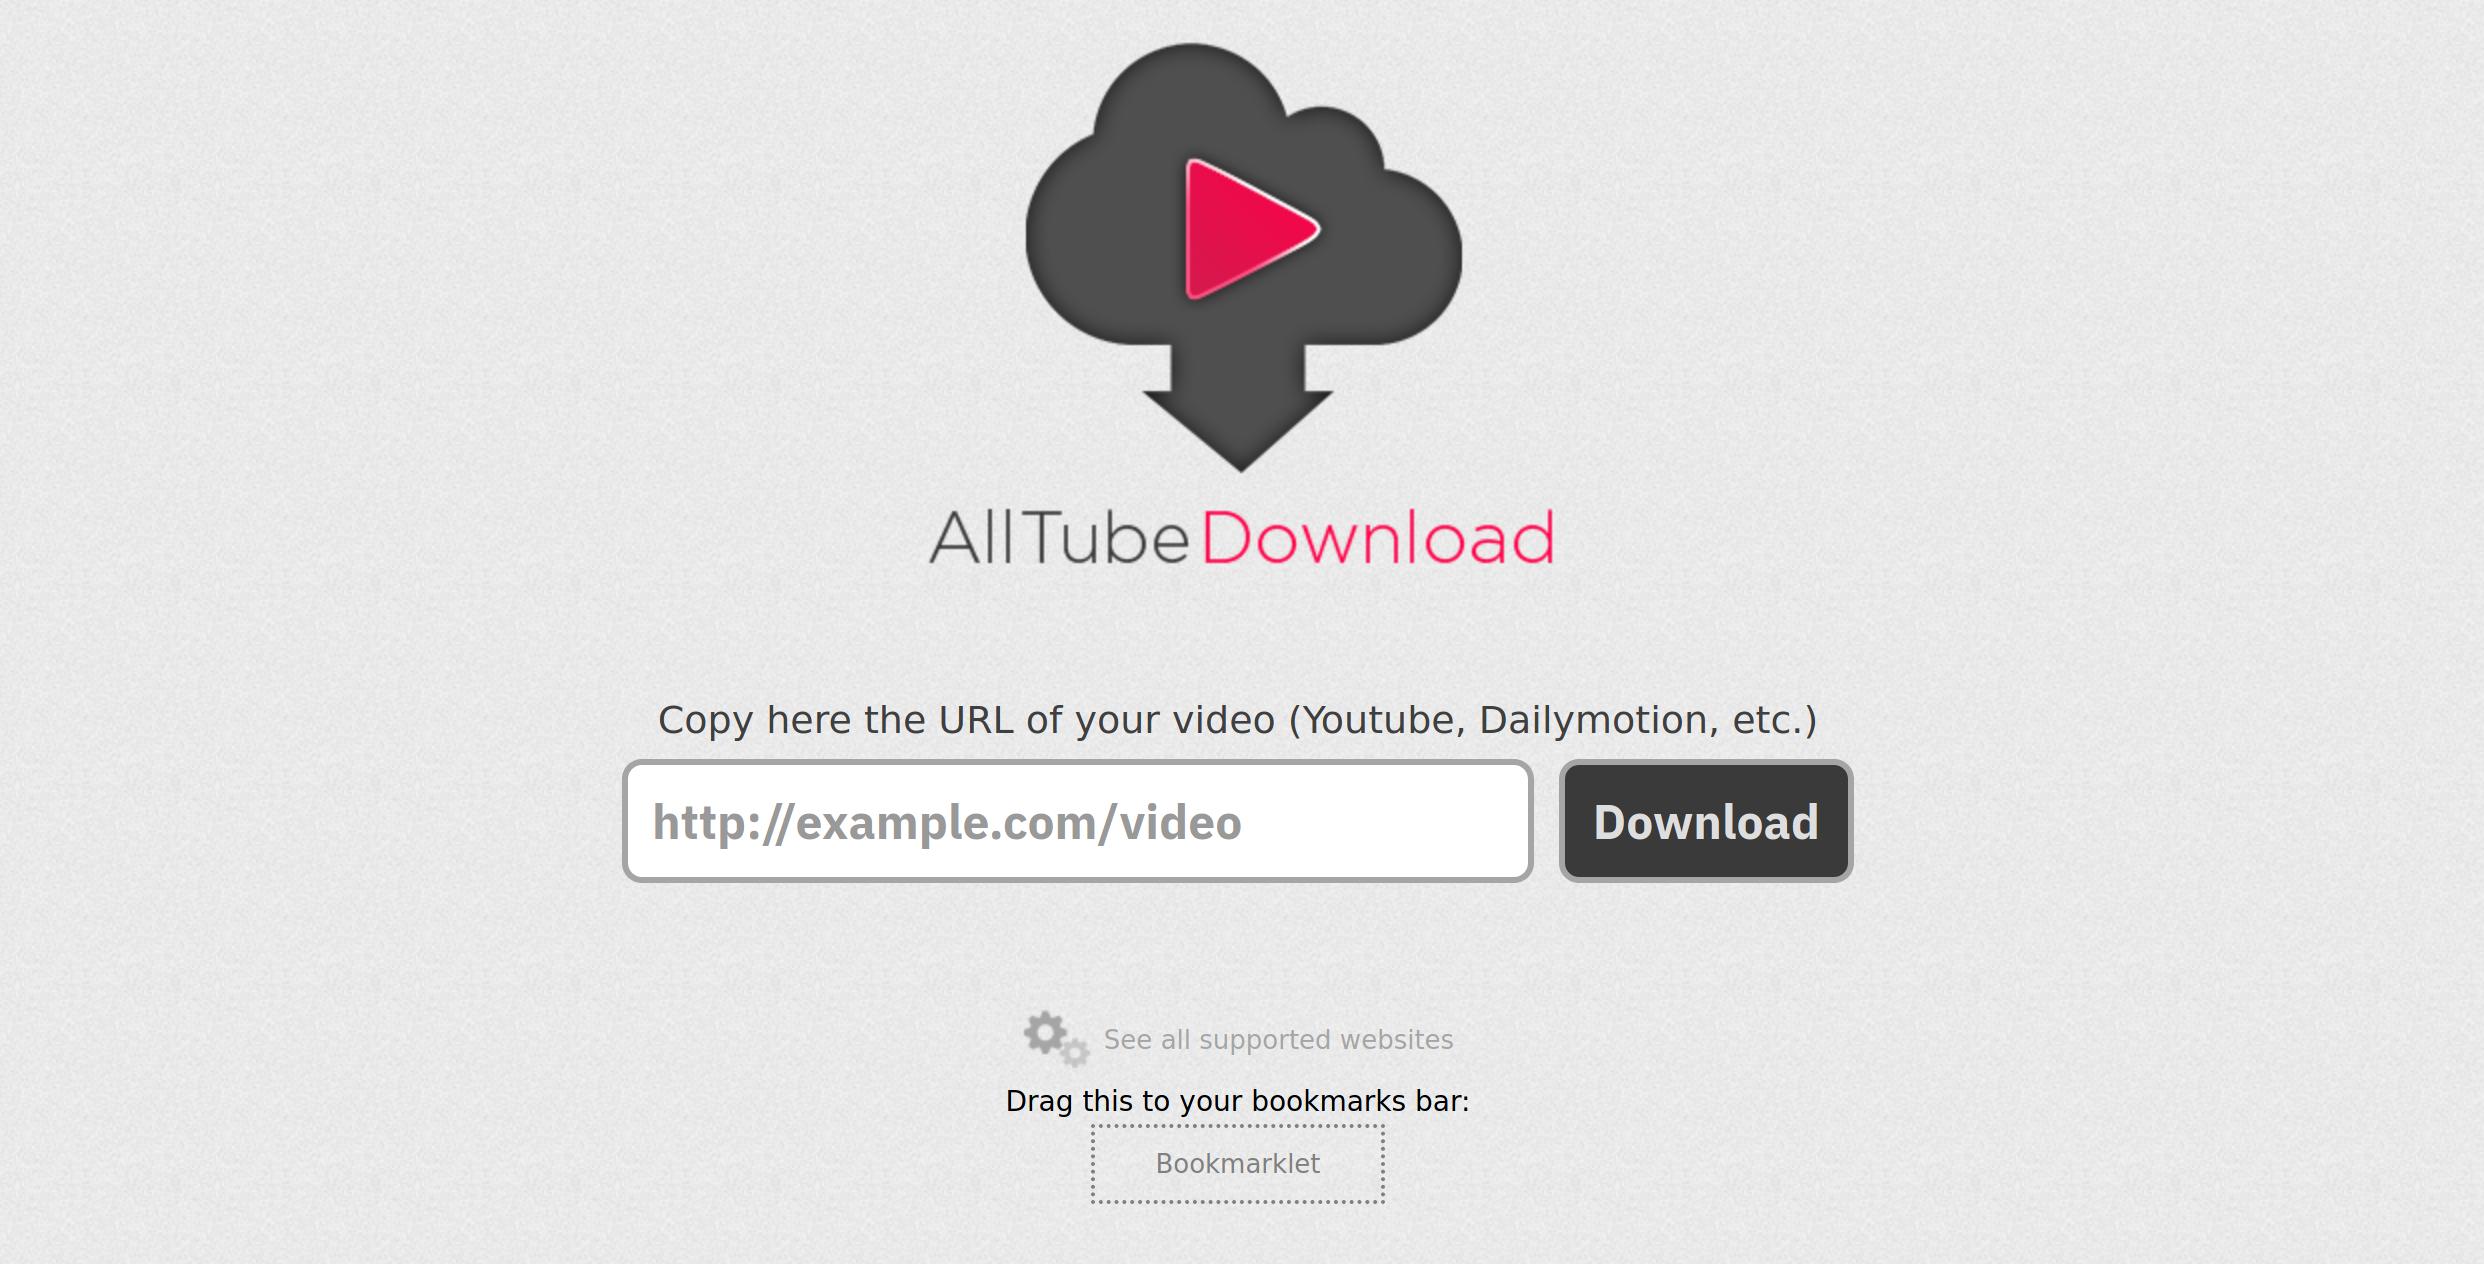 AllTube Screenshot 1